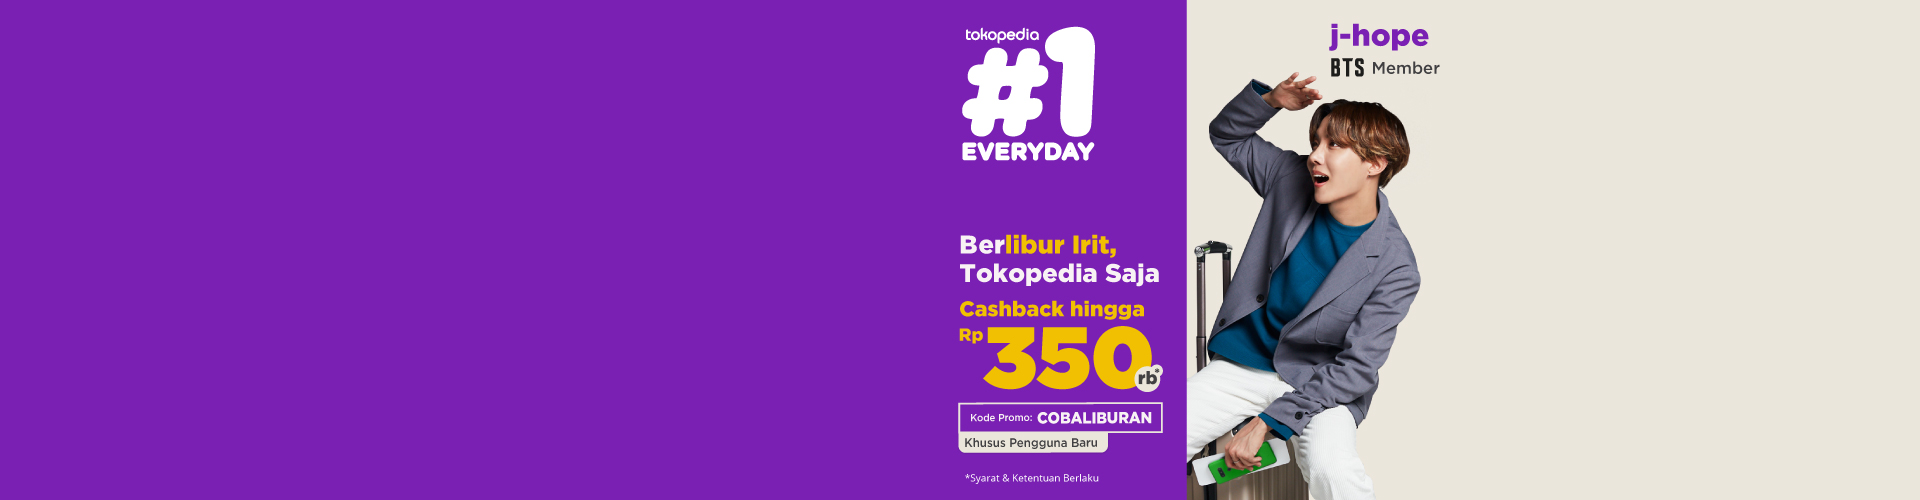 Khusus buat kamu pengguna baru, yuk beli tiket kereta di Tokopedia dan dapatkan cashback sampai 65ribu!